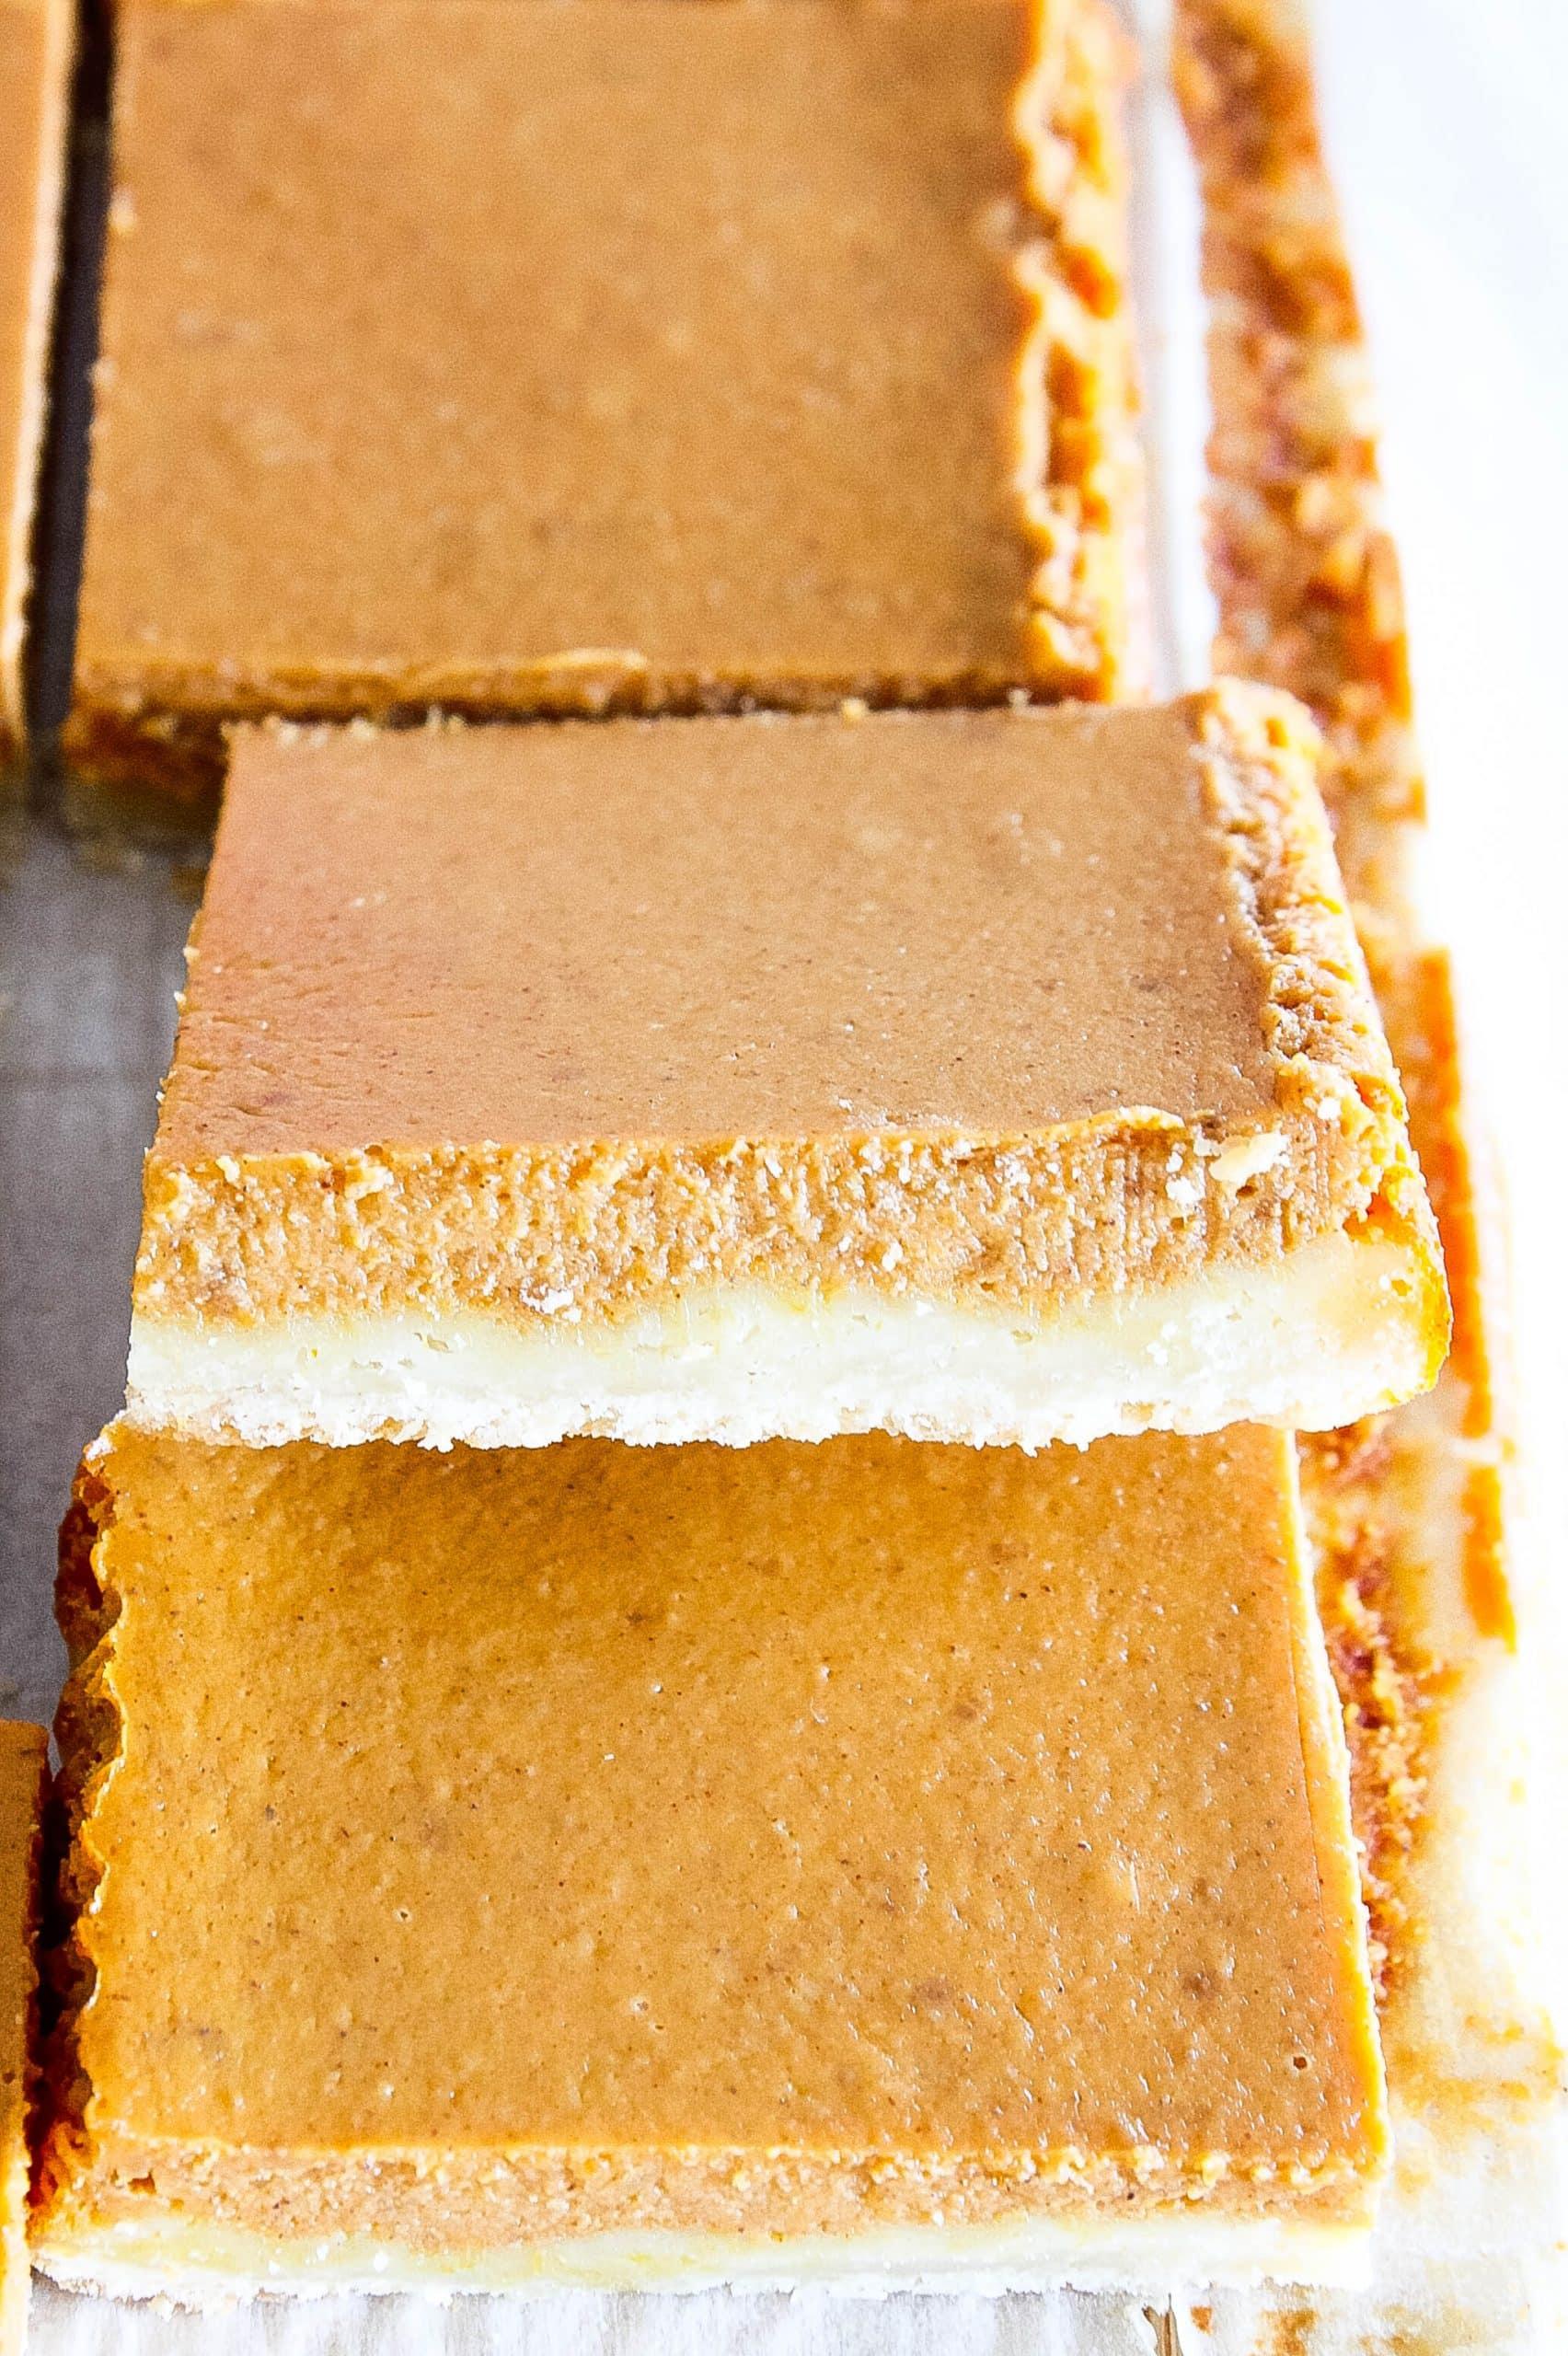 Pumpkin Pie Bars (Made with a Shortbread Crust)